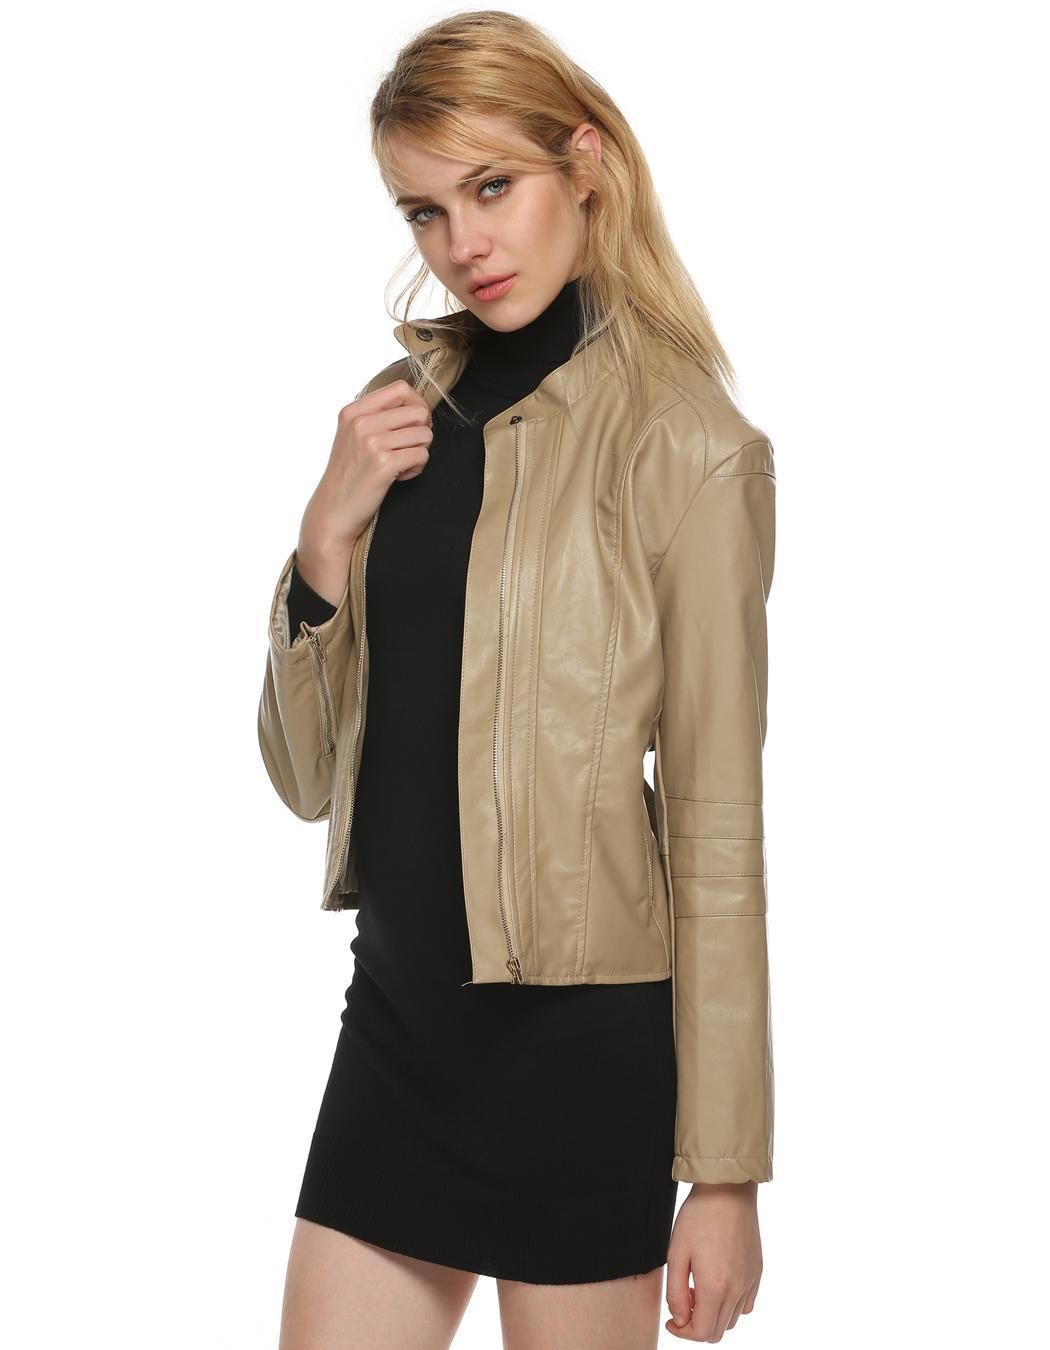 Women Long Sleeve Synthetic Leather Casual Bike Jacket Short Coat 3